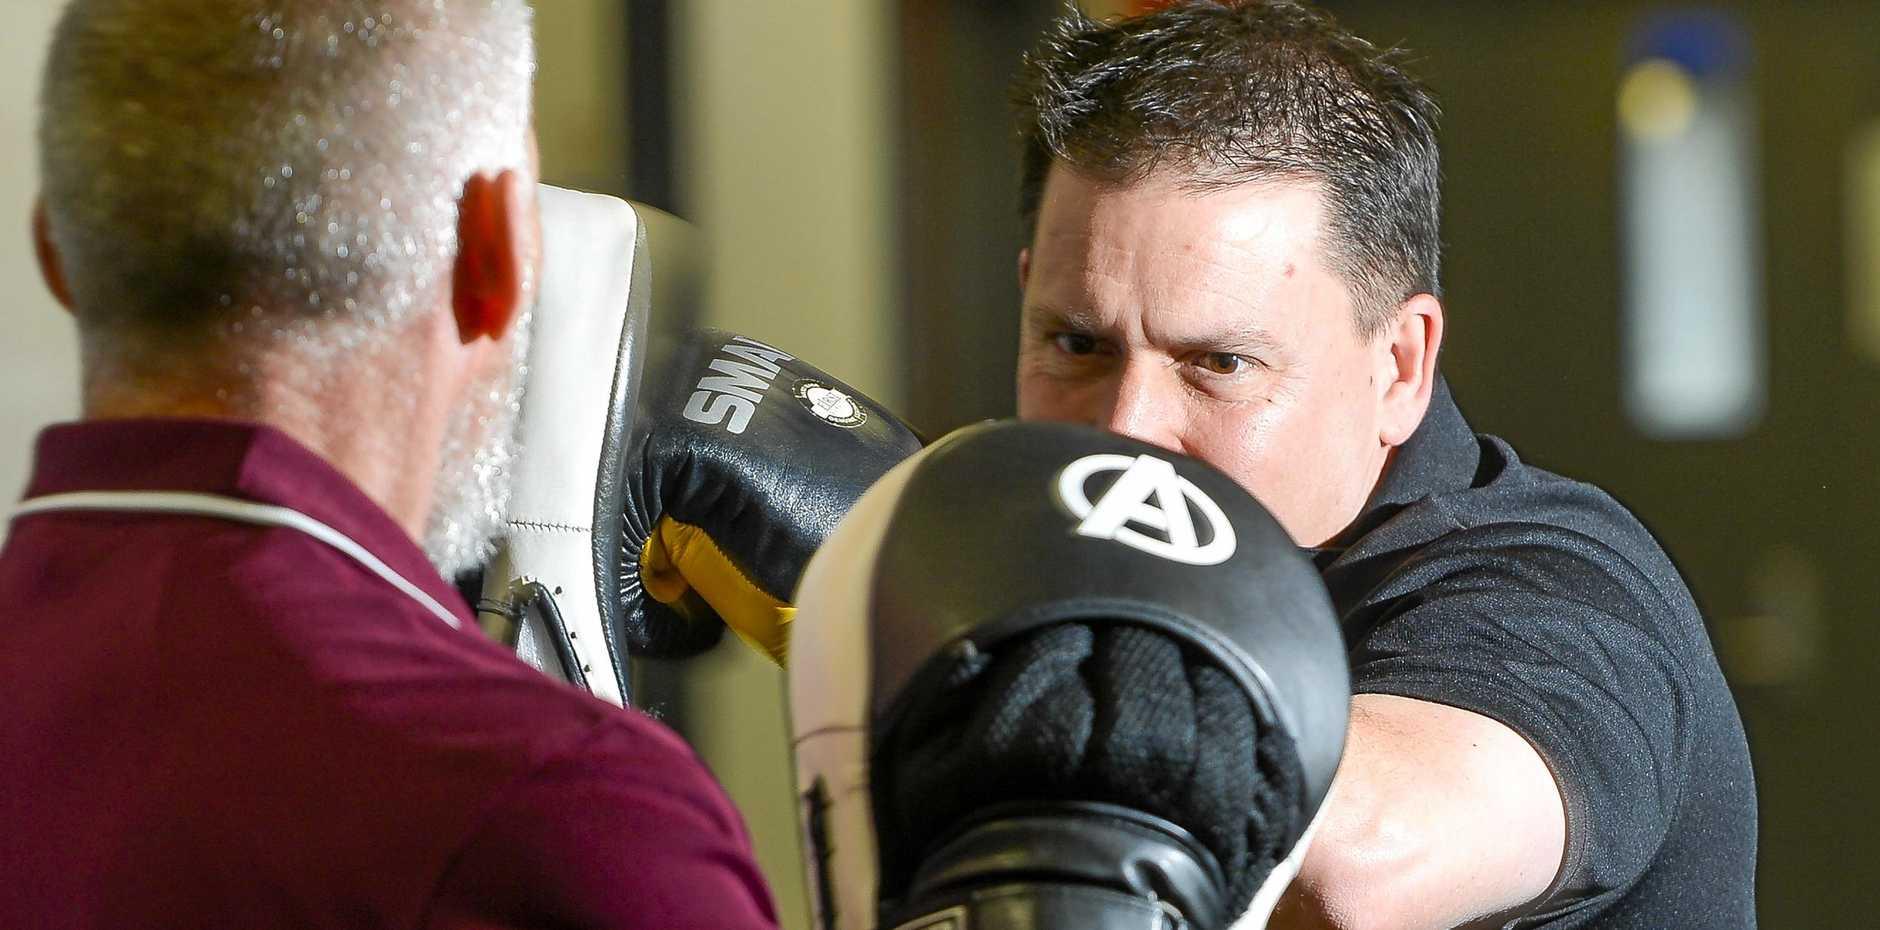 POLLIE PUNCH: Gladstone Mayor Matt Burnett is training hard in the lead up to his bout against Member for Gladstone Glenn Butcher.